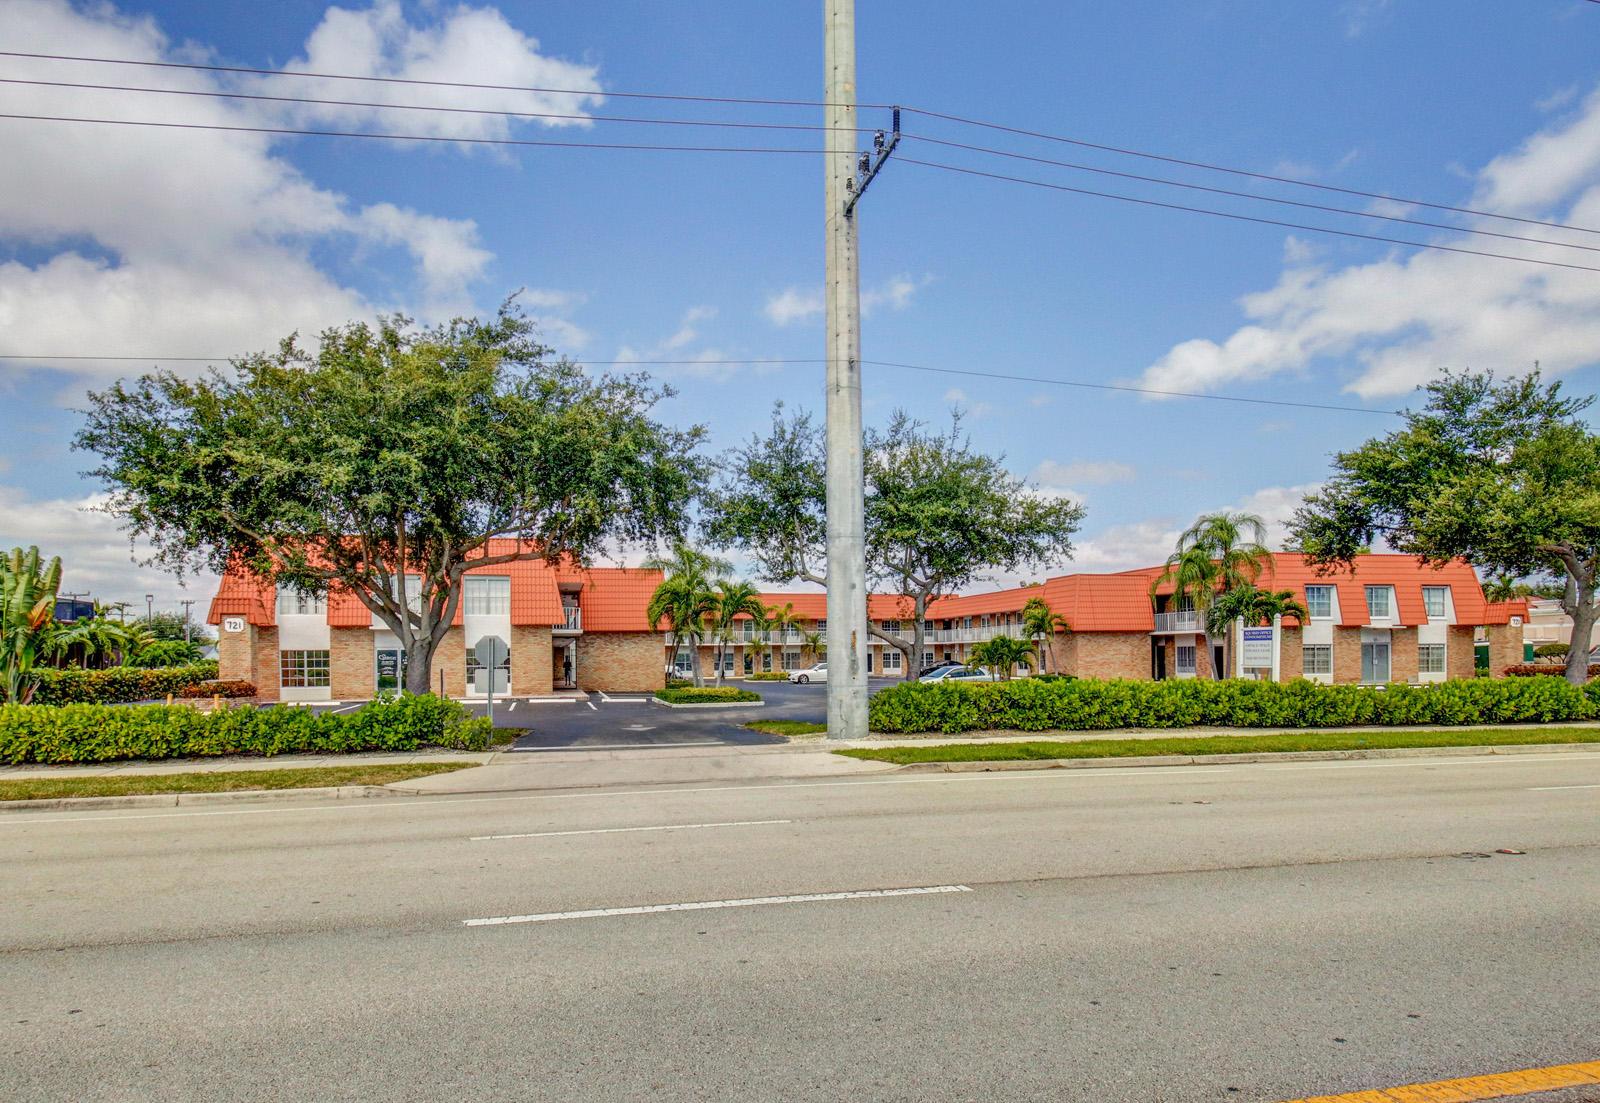 721 Us Highway 1 Unit 217, North Palm Beach, Florida 33408